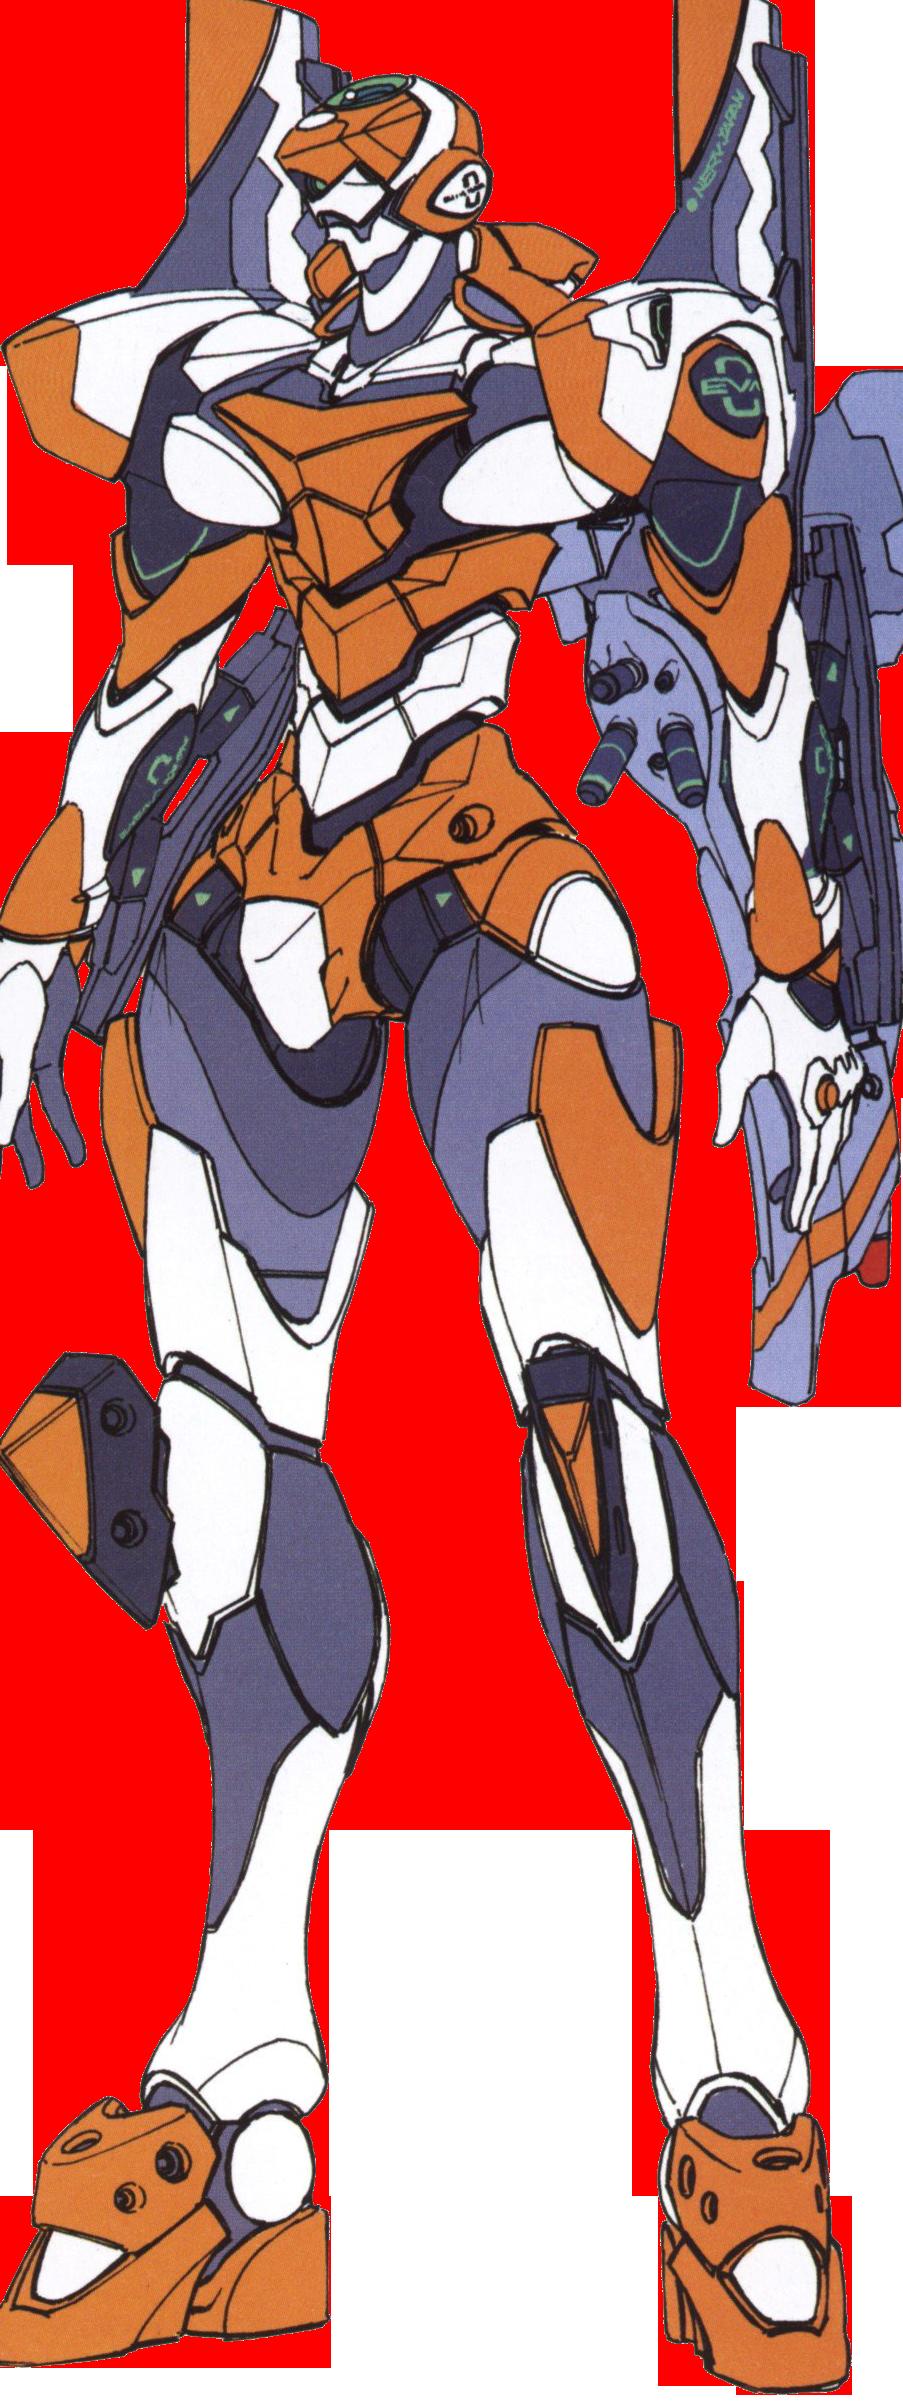 20130426073519!Evangelion_Unit-0.0.png (PNG Image, 903×2402 pixels) - Scaled (29%)